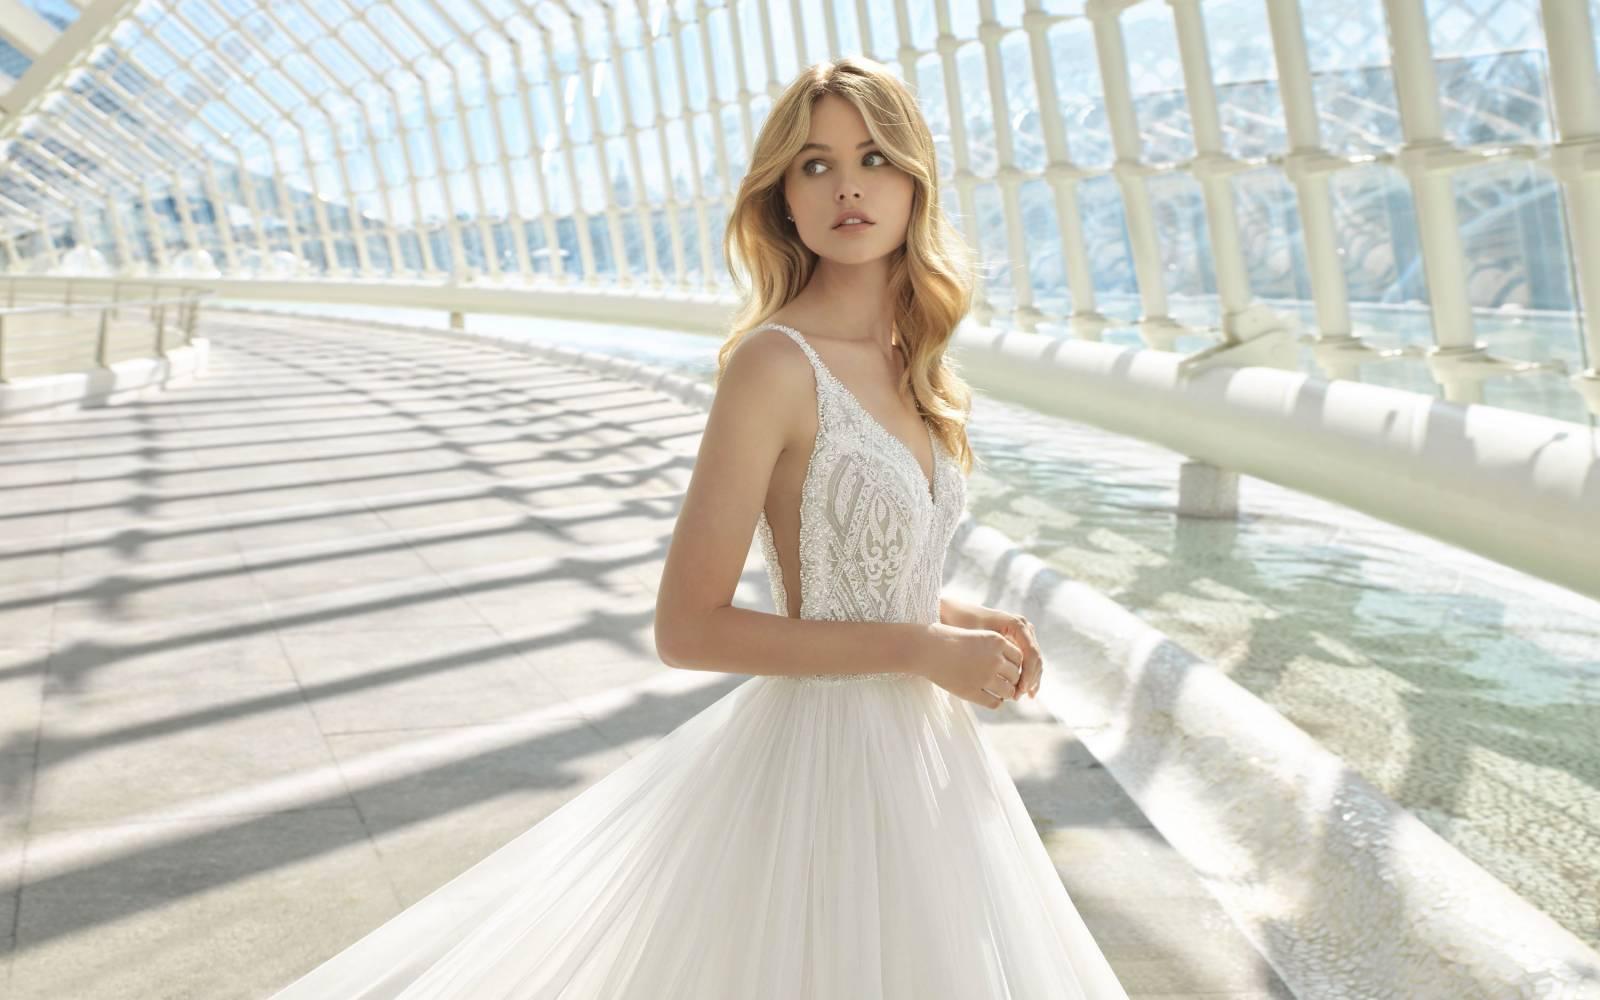 Maxim's Couture - Bruidsmode - Bruidsmodewinkel - Trouwjurk - House of Weddings - 25